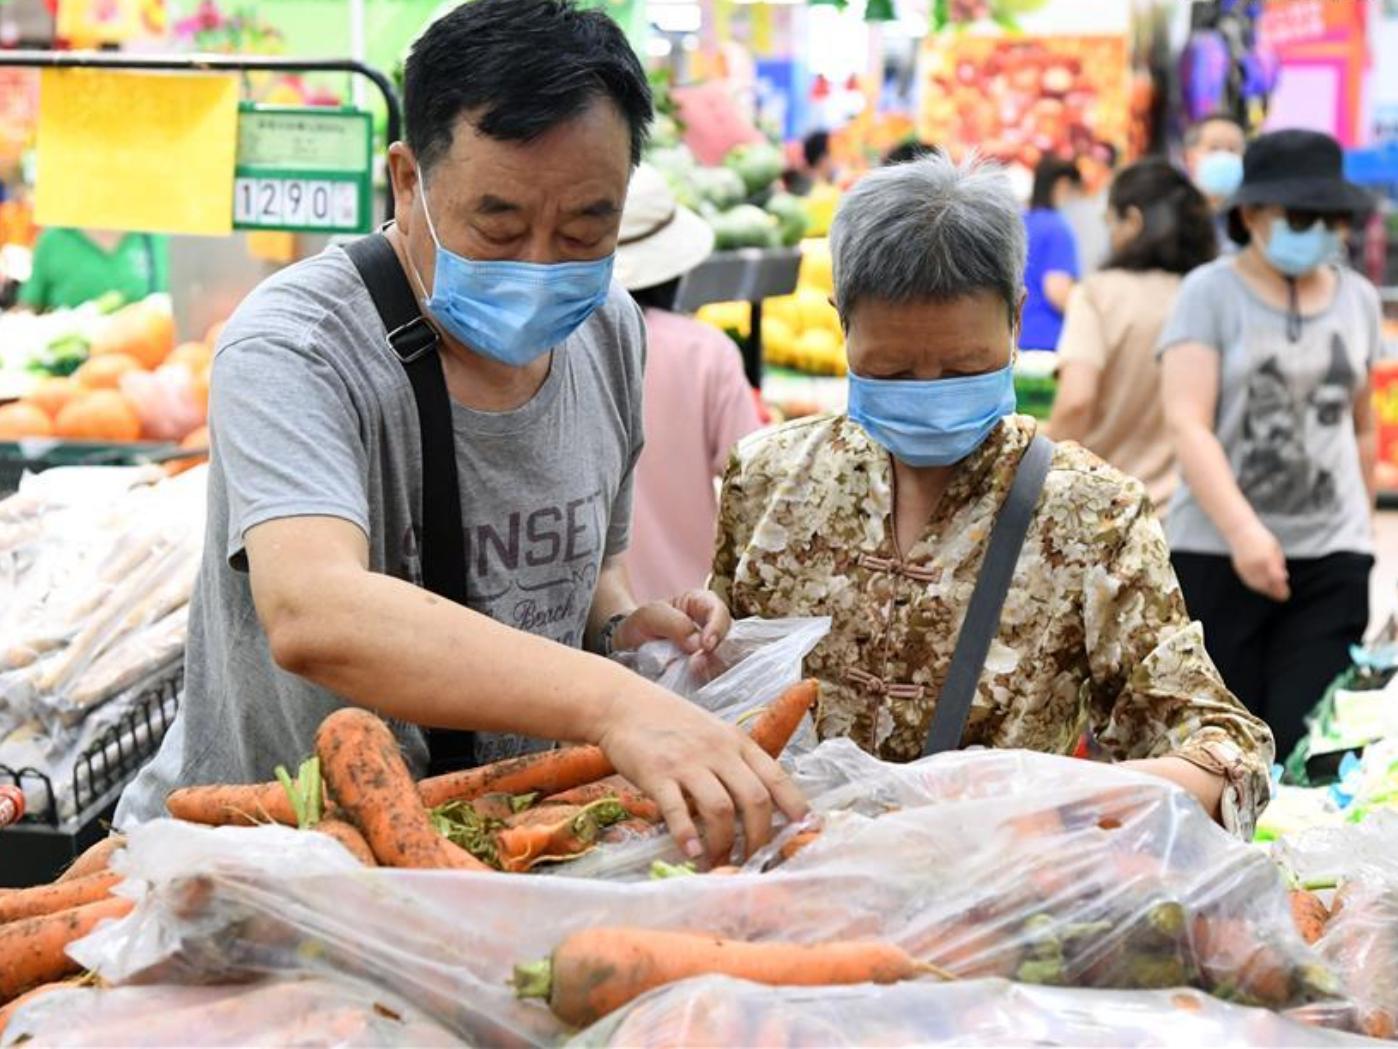 Beijing disinfects 276 farm produce markets amid COVID-19 fears